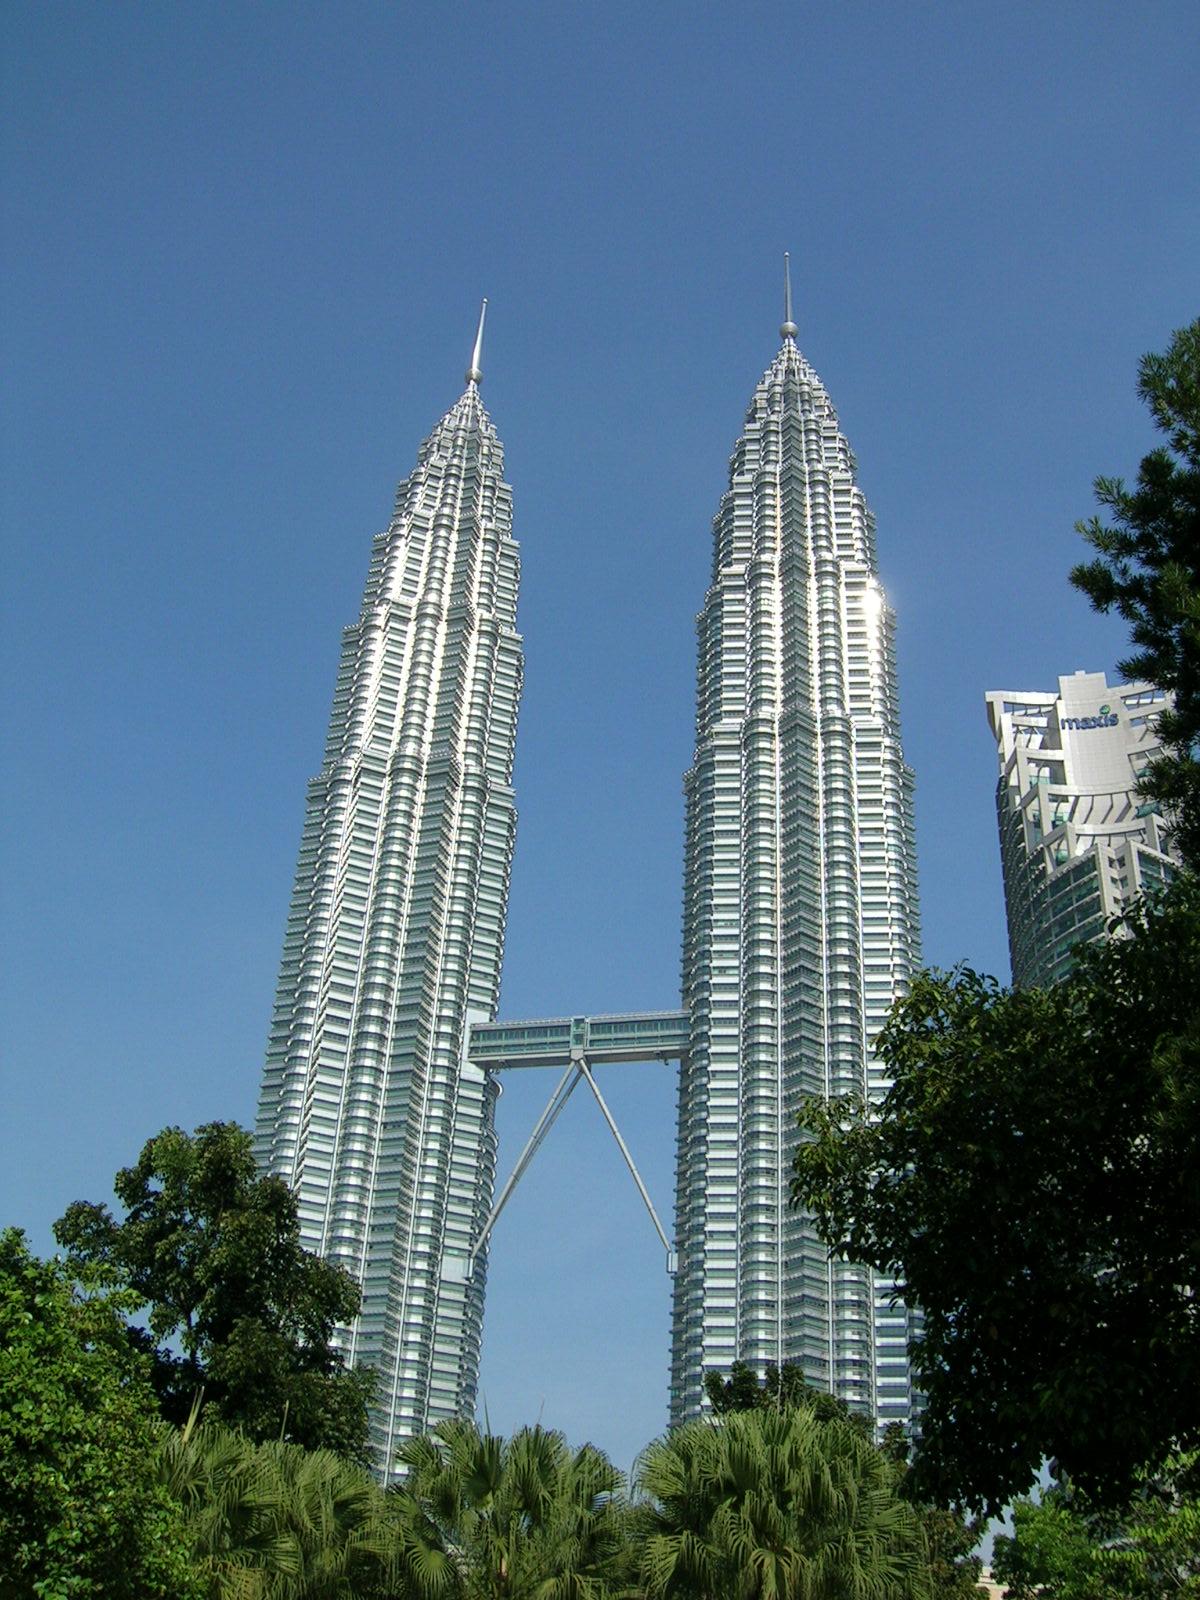 Petronas Towers in Kuala Lumpur, Malaysia. Photo: Formulax.